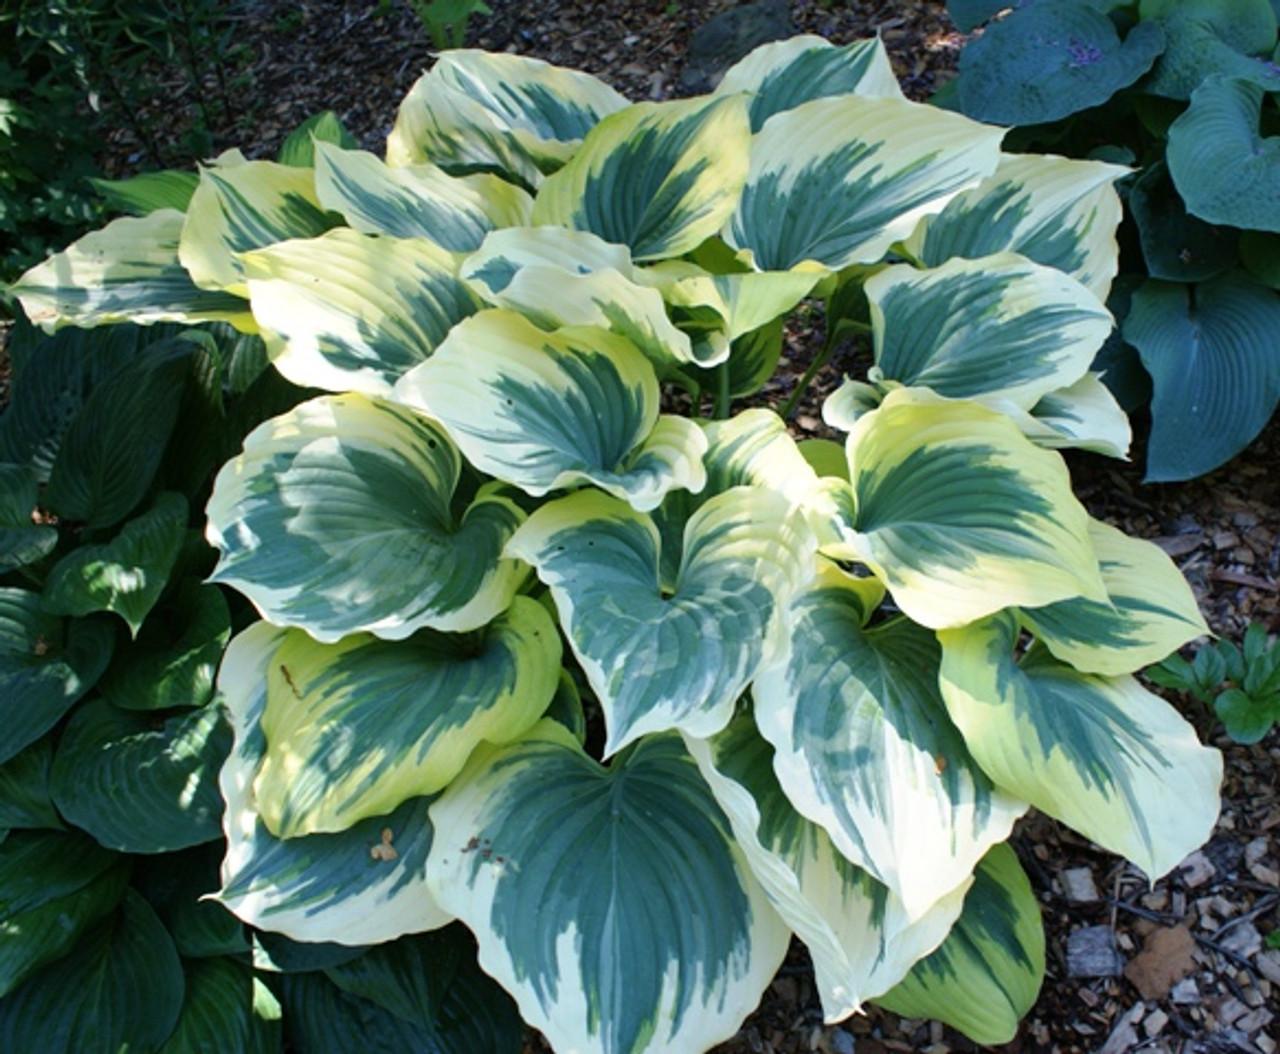 Liberty Hosta Pp12531 Shade Perennial Giant Sun Tolerant Hosta Plant